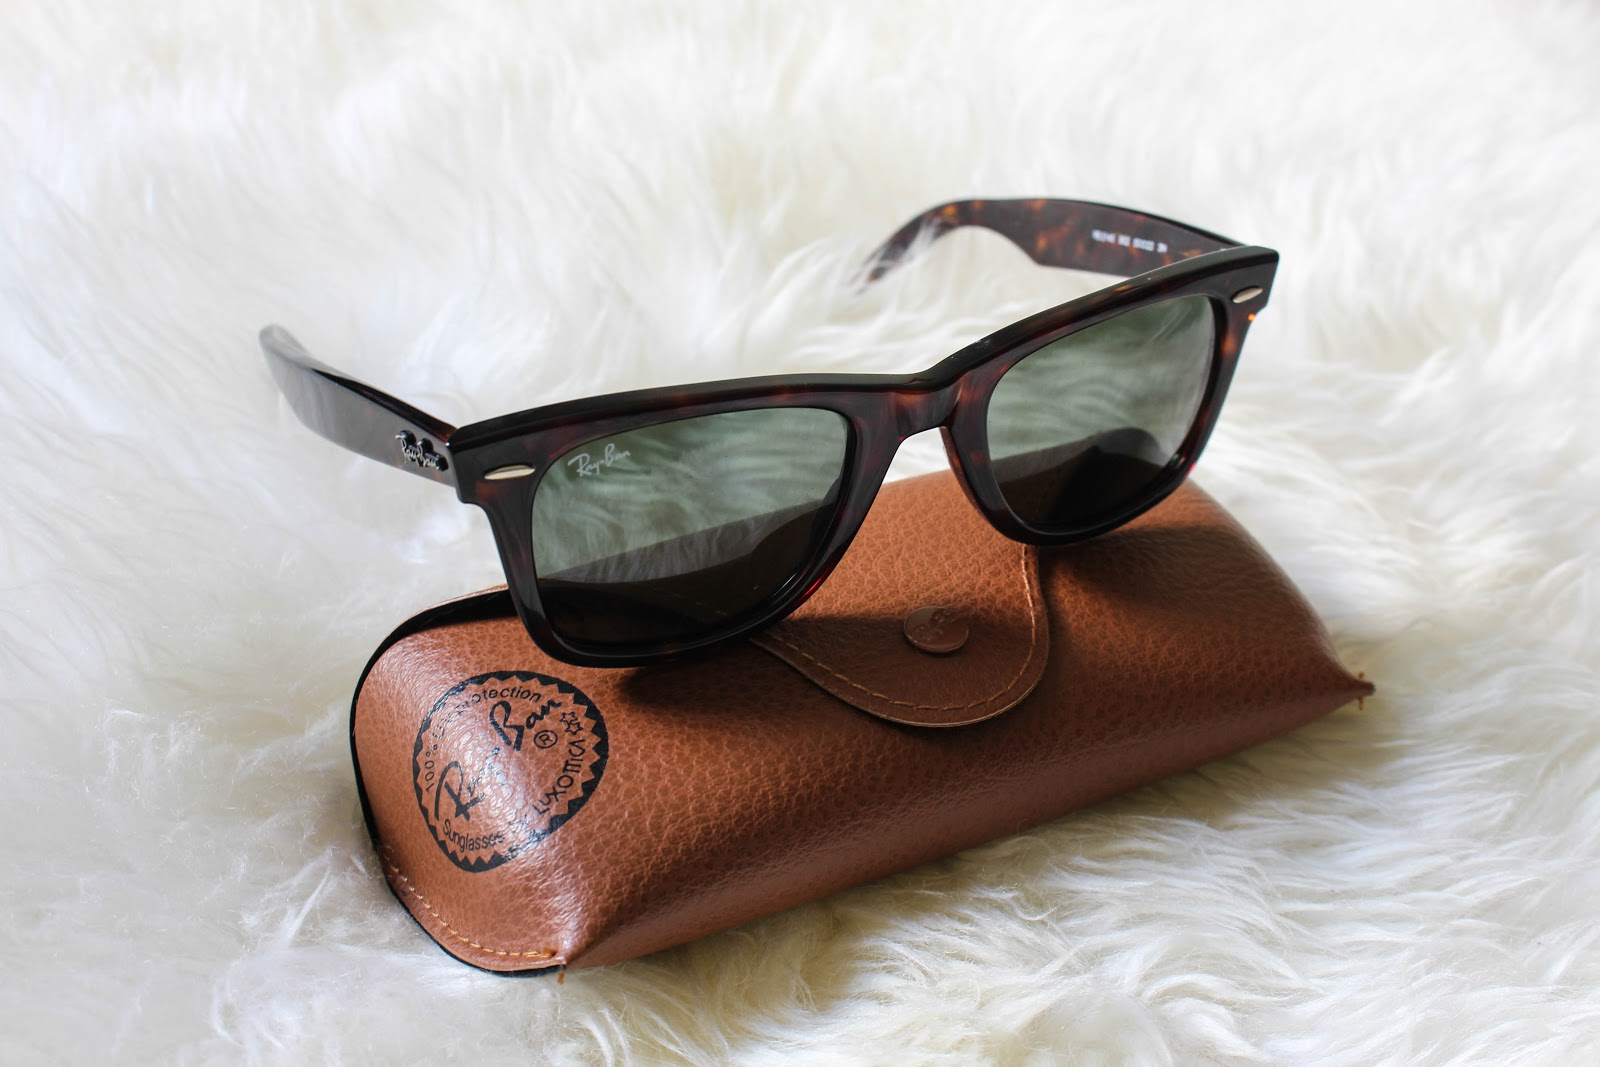 raybans, krystel couture, designer, style, sunglasses, tortoiseshell,